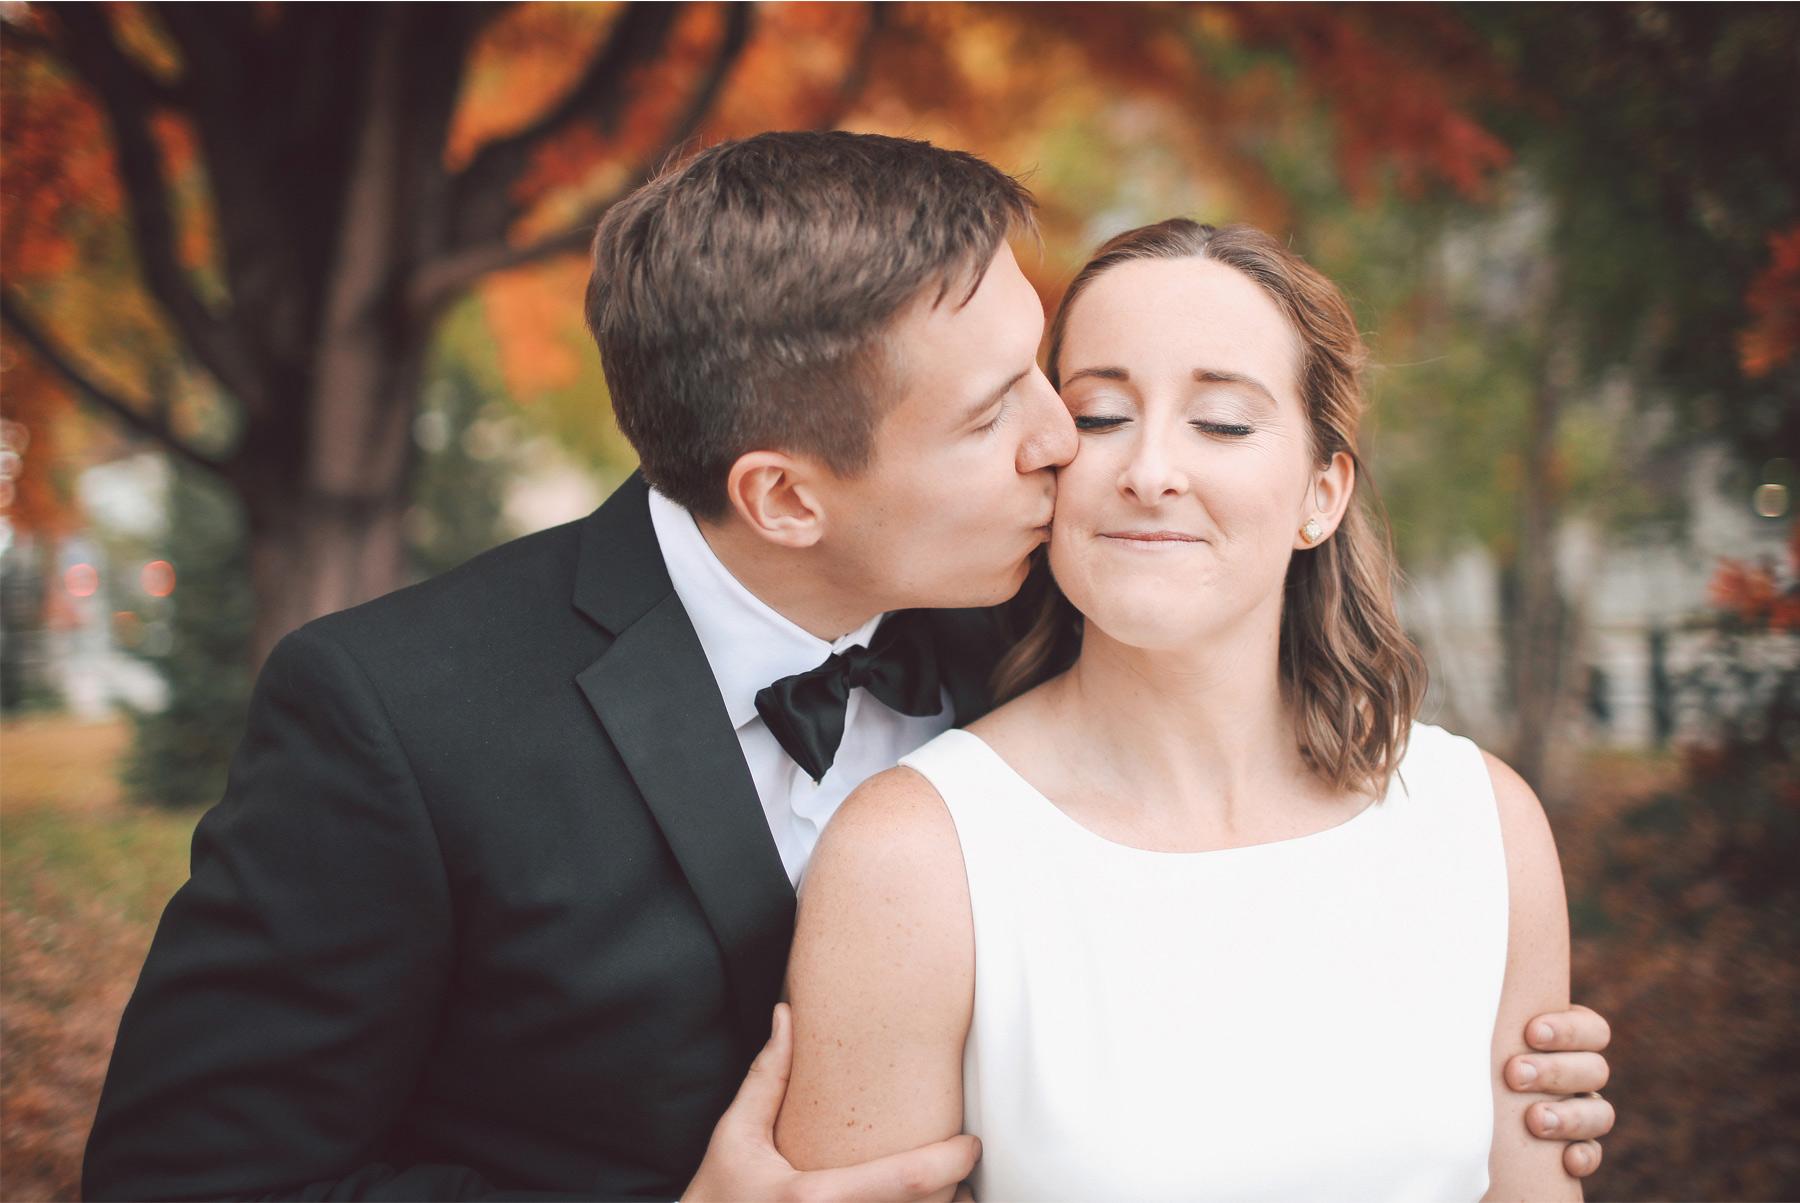 11-Saint-Paul-Minnesota-Wedding-Photographer-by-Andrew-Vick-Photography-Fall-Autumn-Rice-Park-Bride-Groom-Kiss-Vintage-Kathryn-and-Sam.jpg